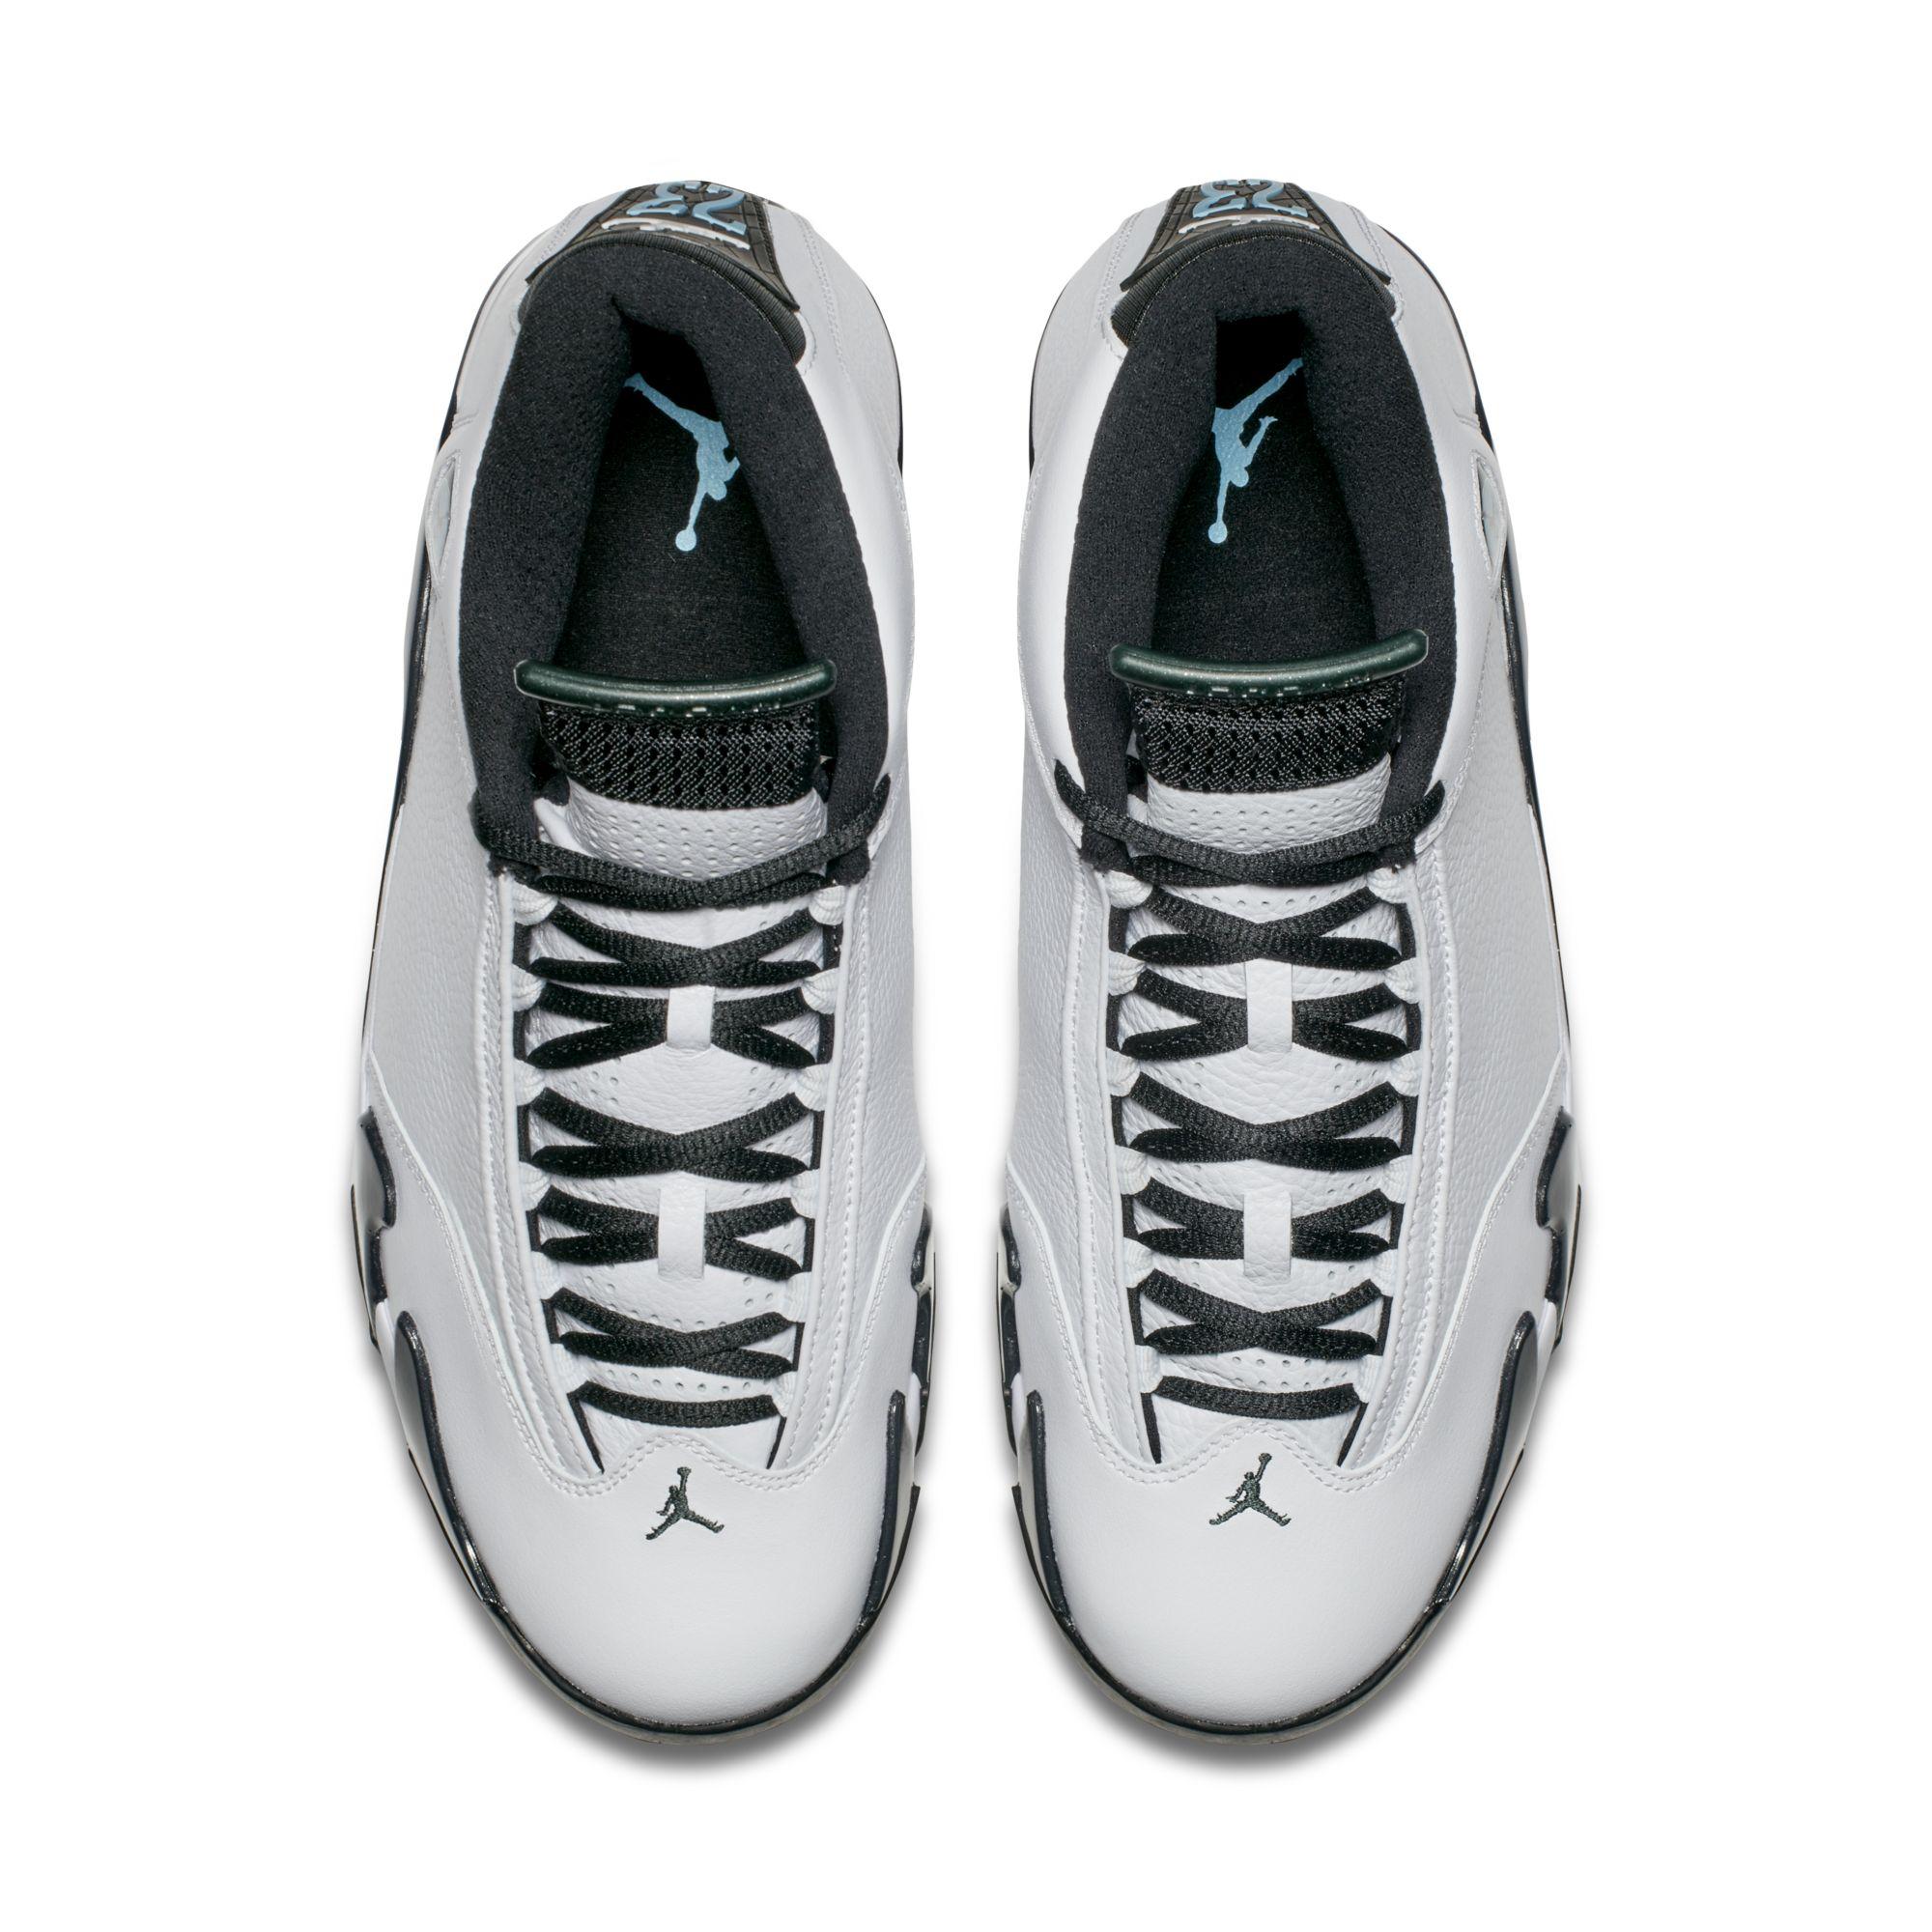 8cb783c4a4bd Air Jordan XIV Oxidized Green - top View - WearTesters